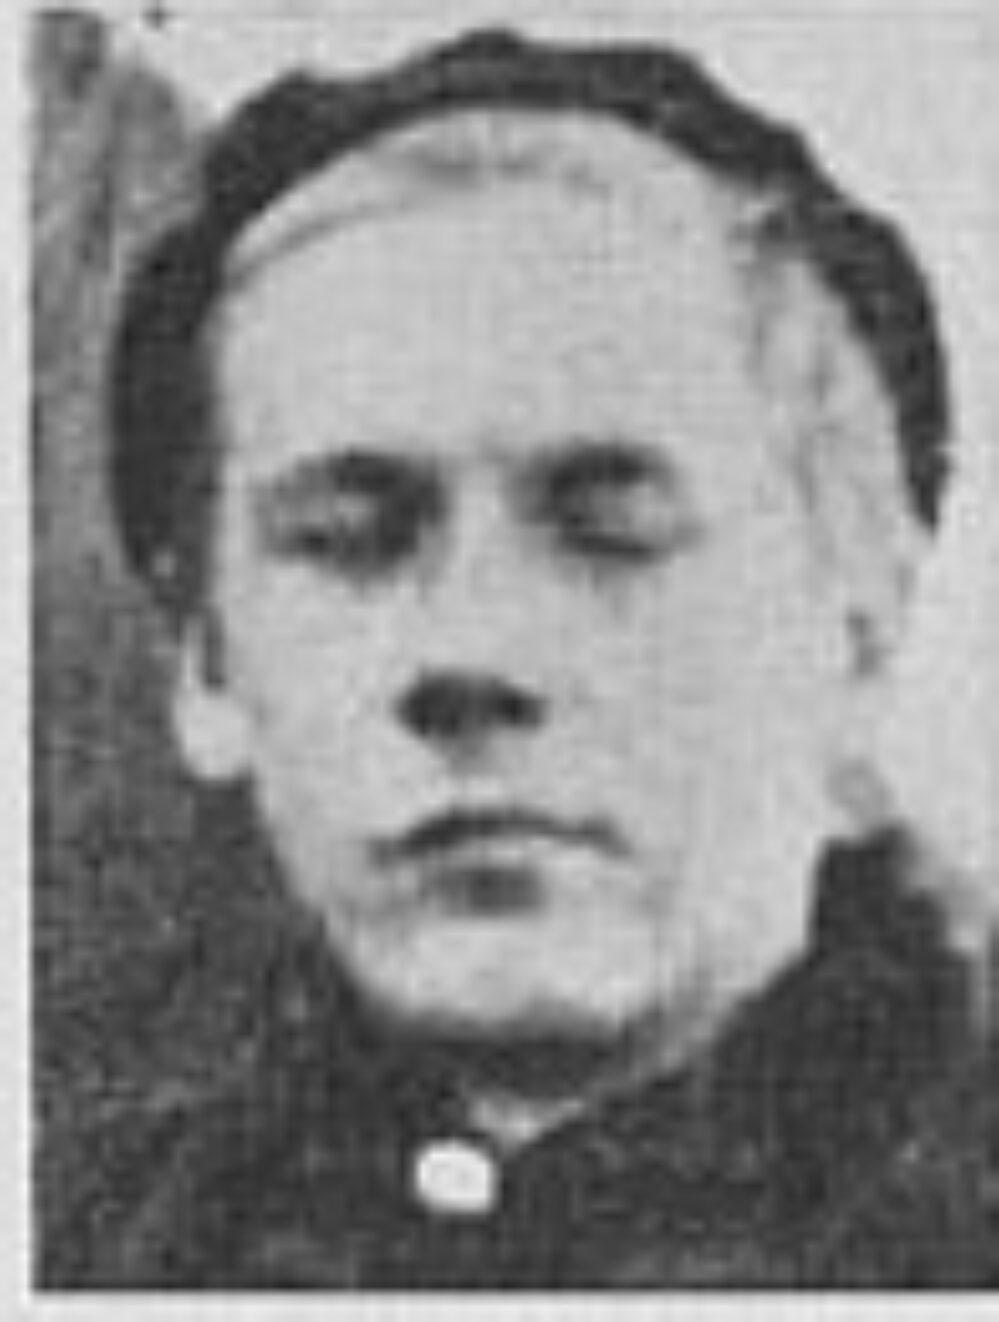 Torgny Eugen Thygesen